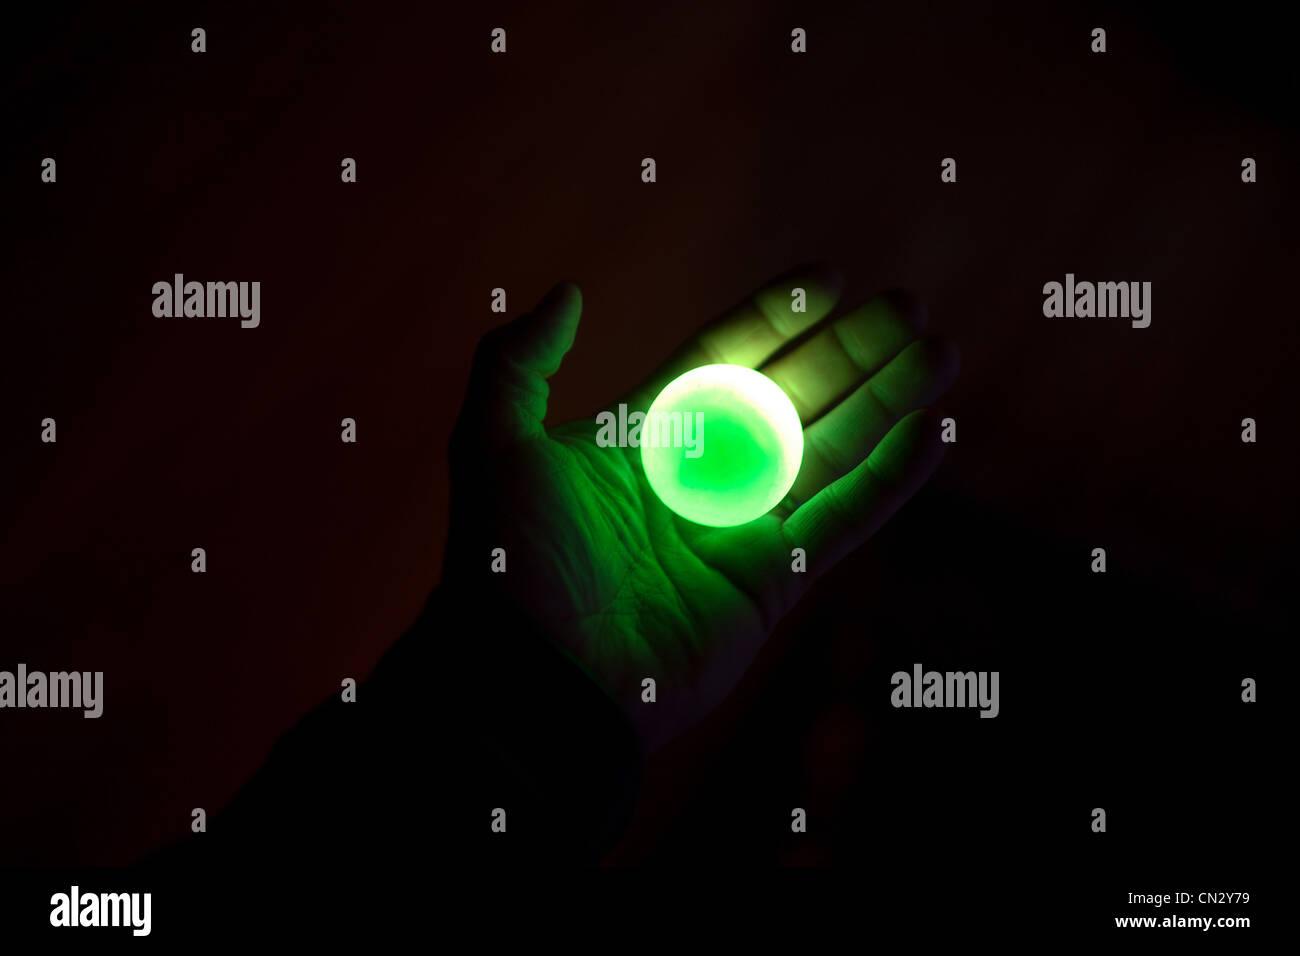 Persona sosteniendo la bola verde iluminada Imagen De Stock